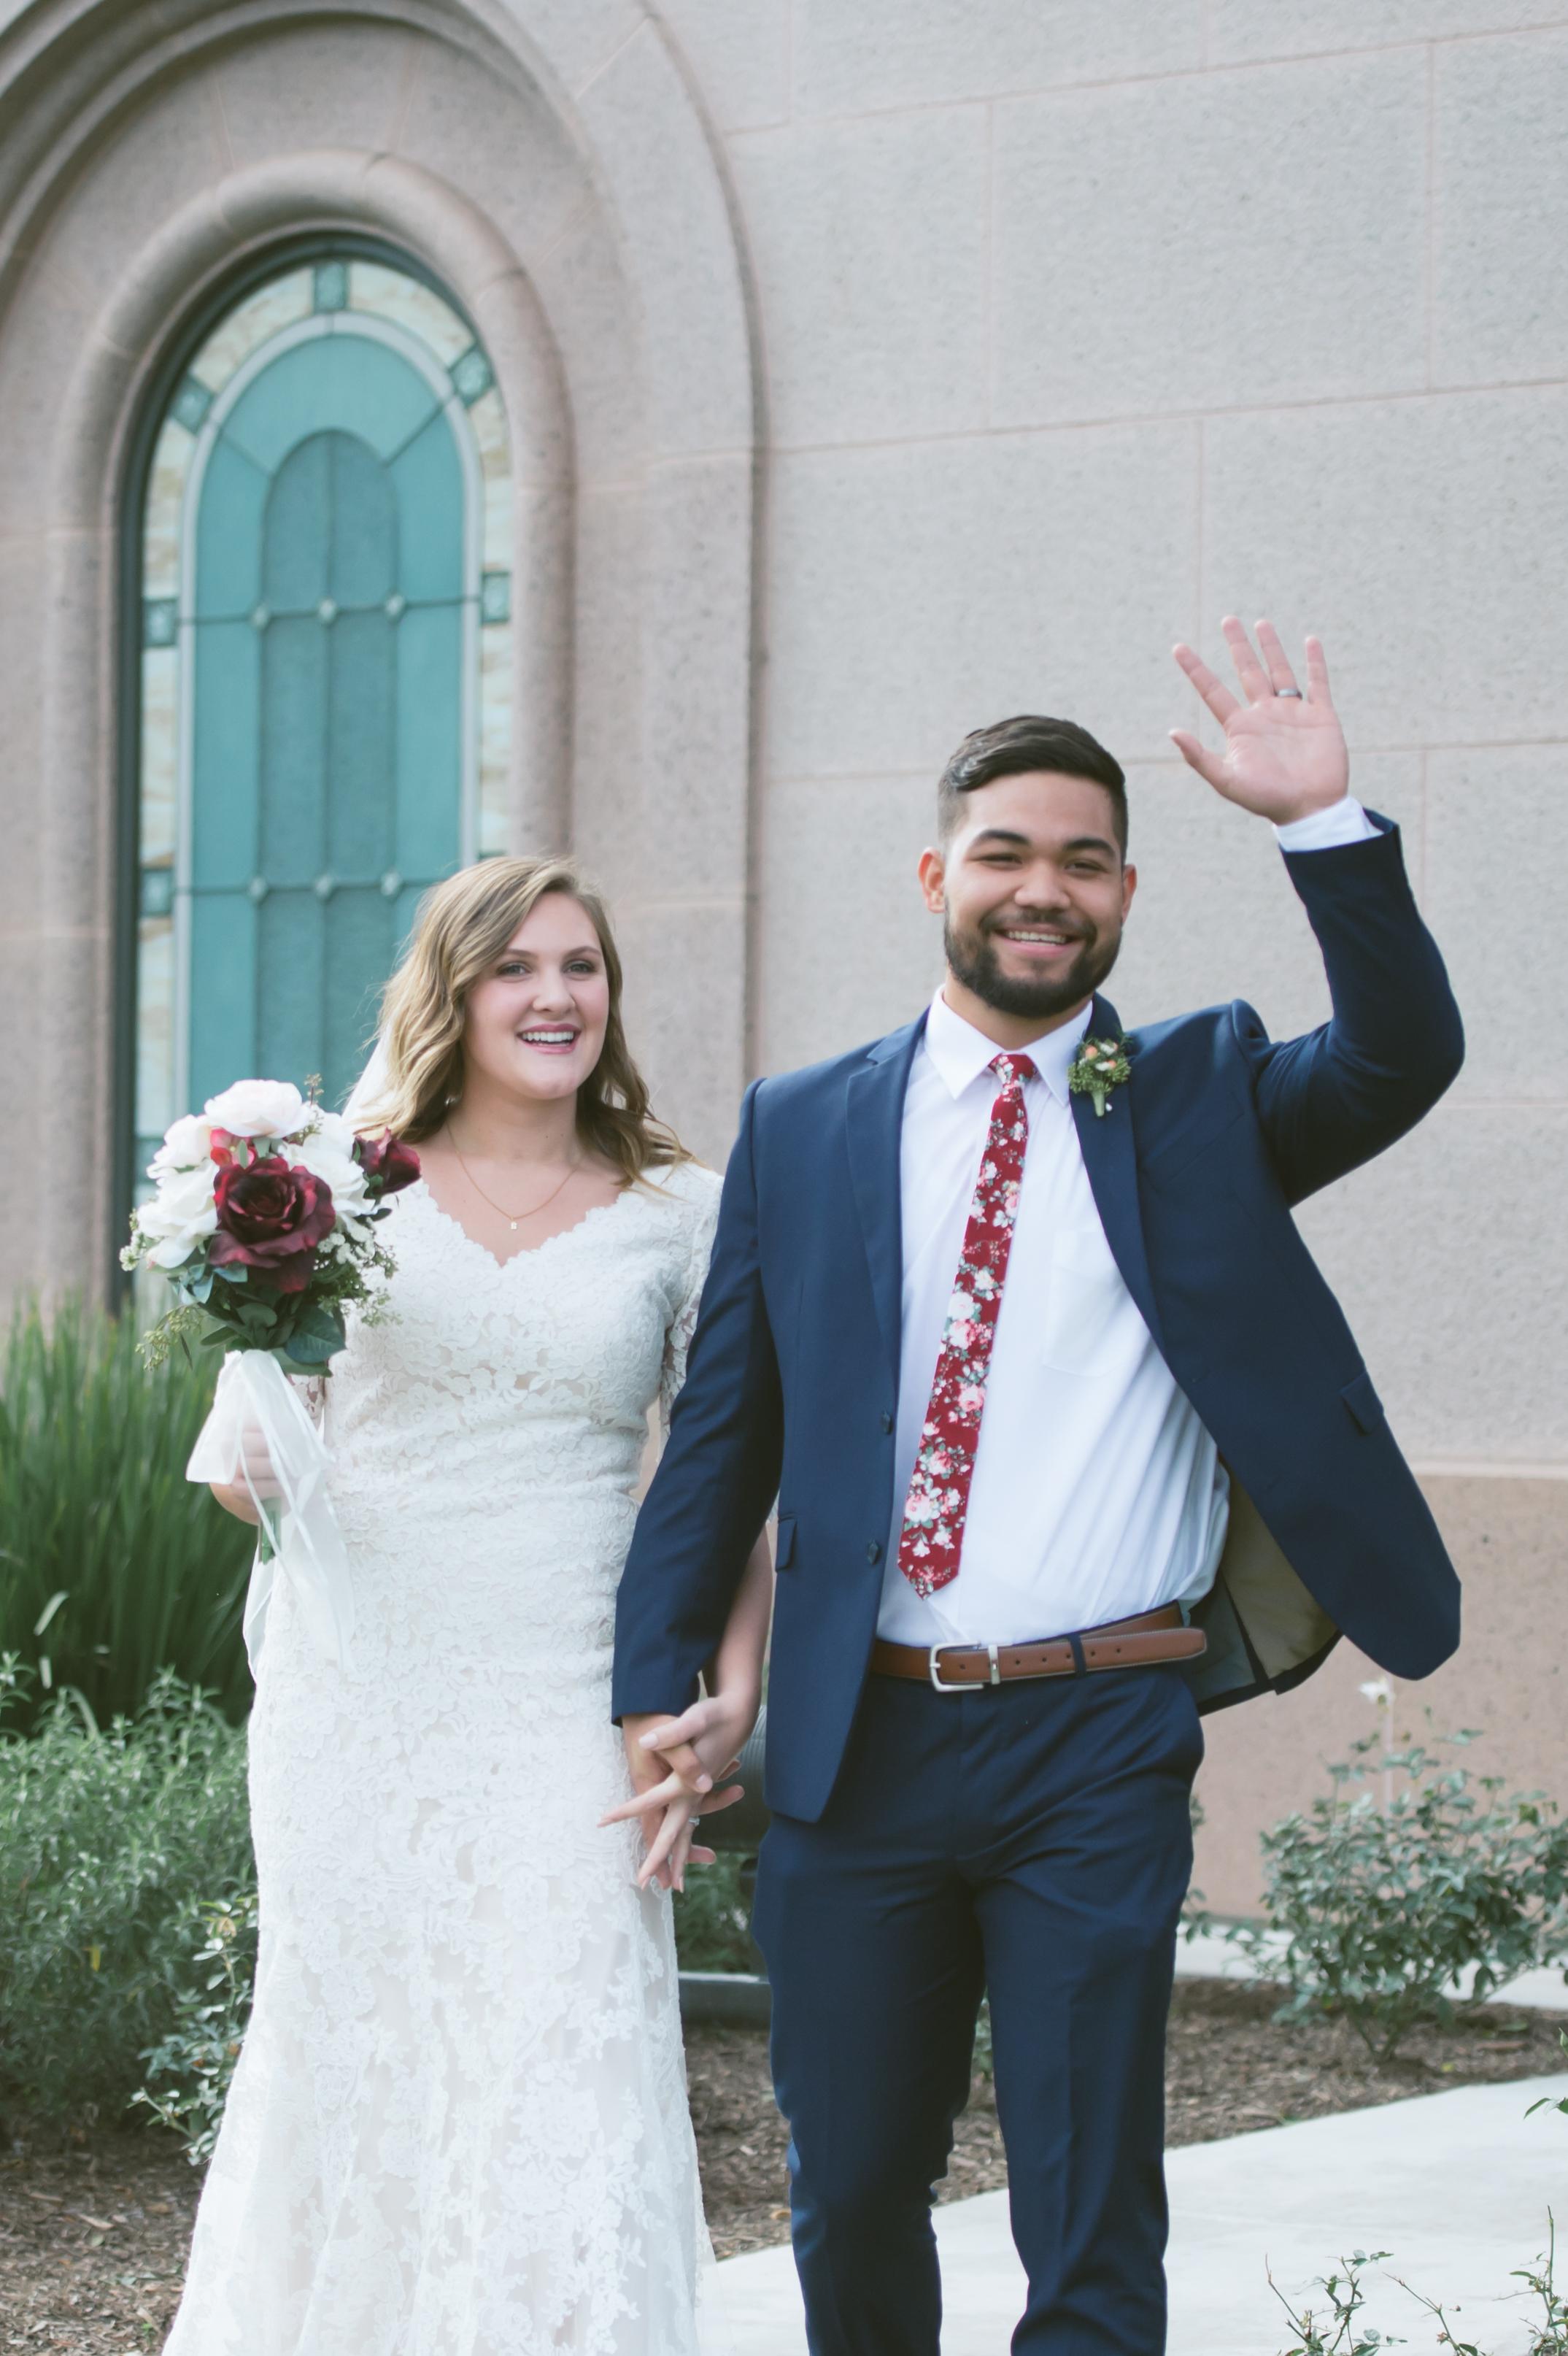 02Newport Beach LDS Temple Wedding Pictures.jpg